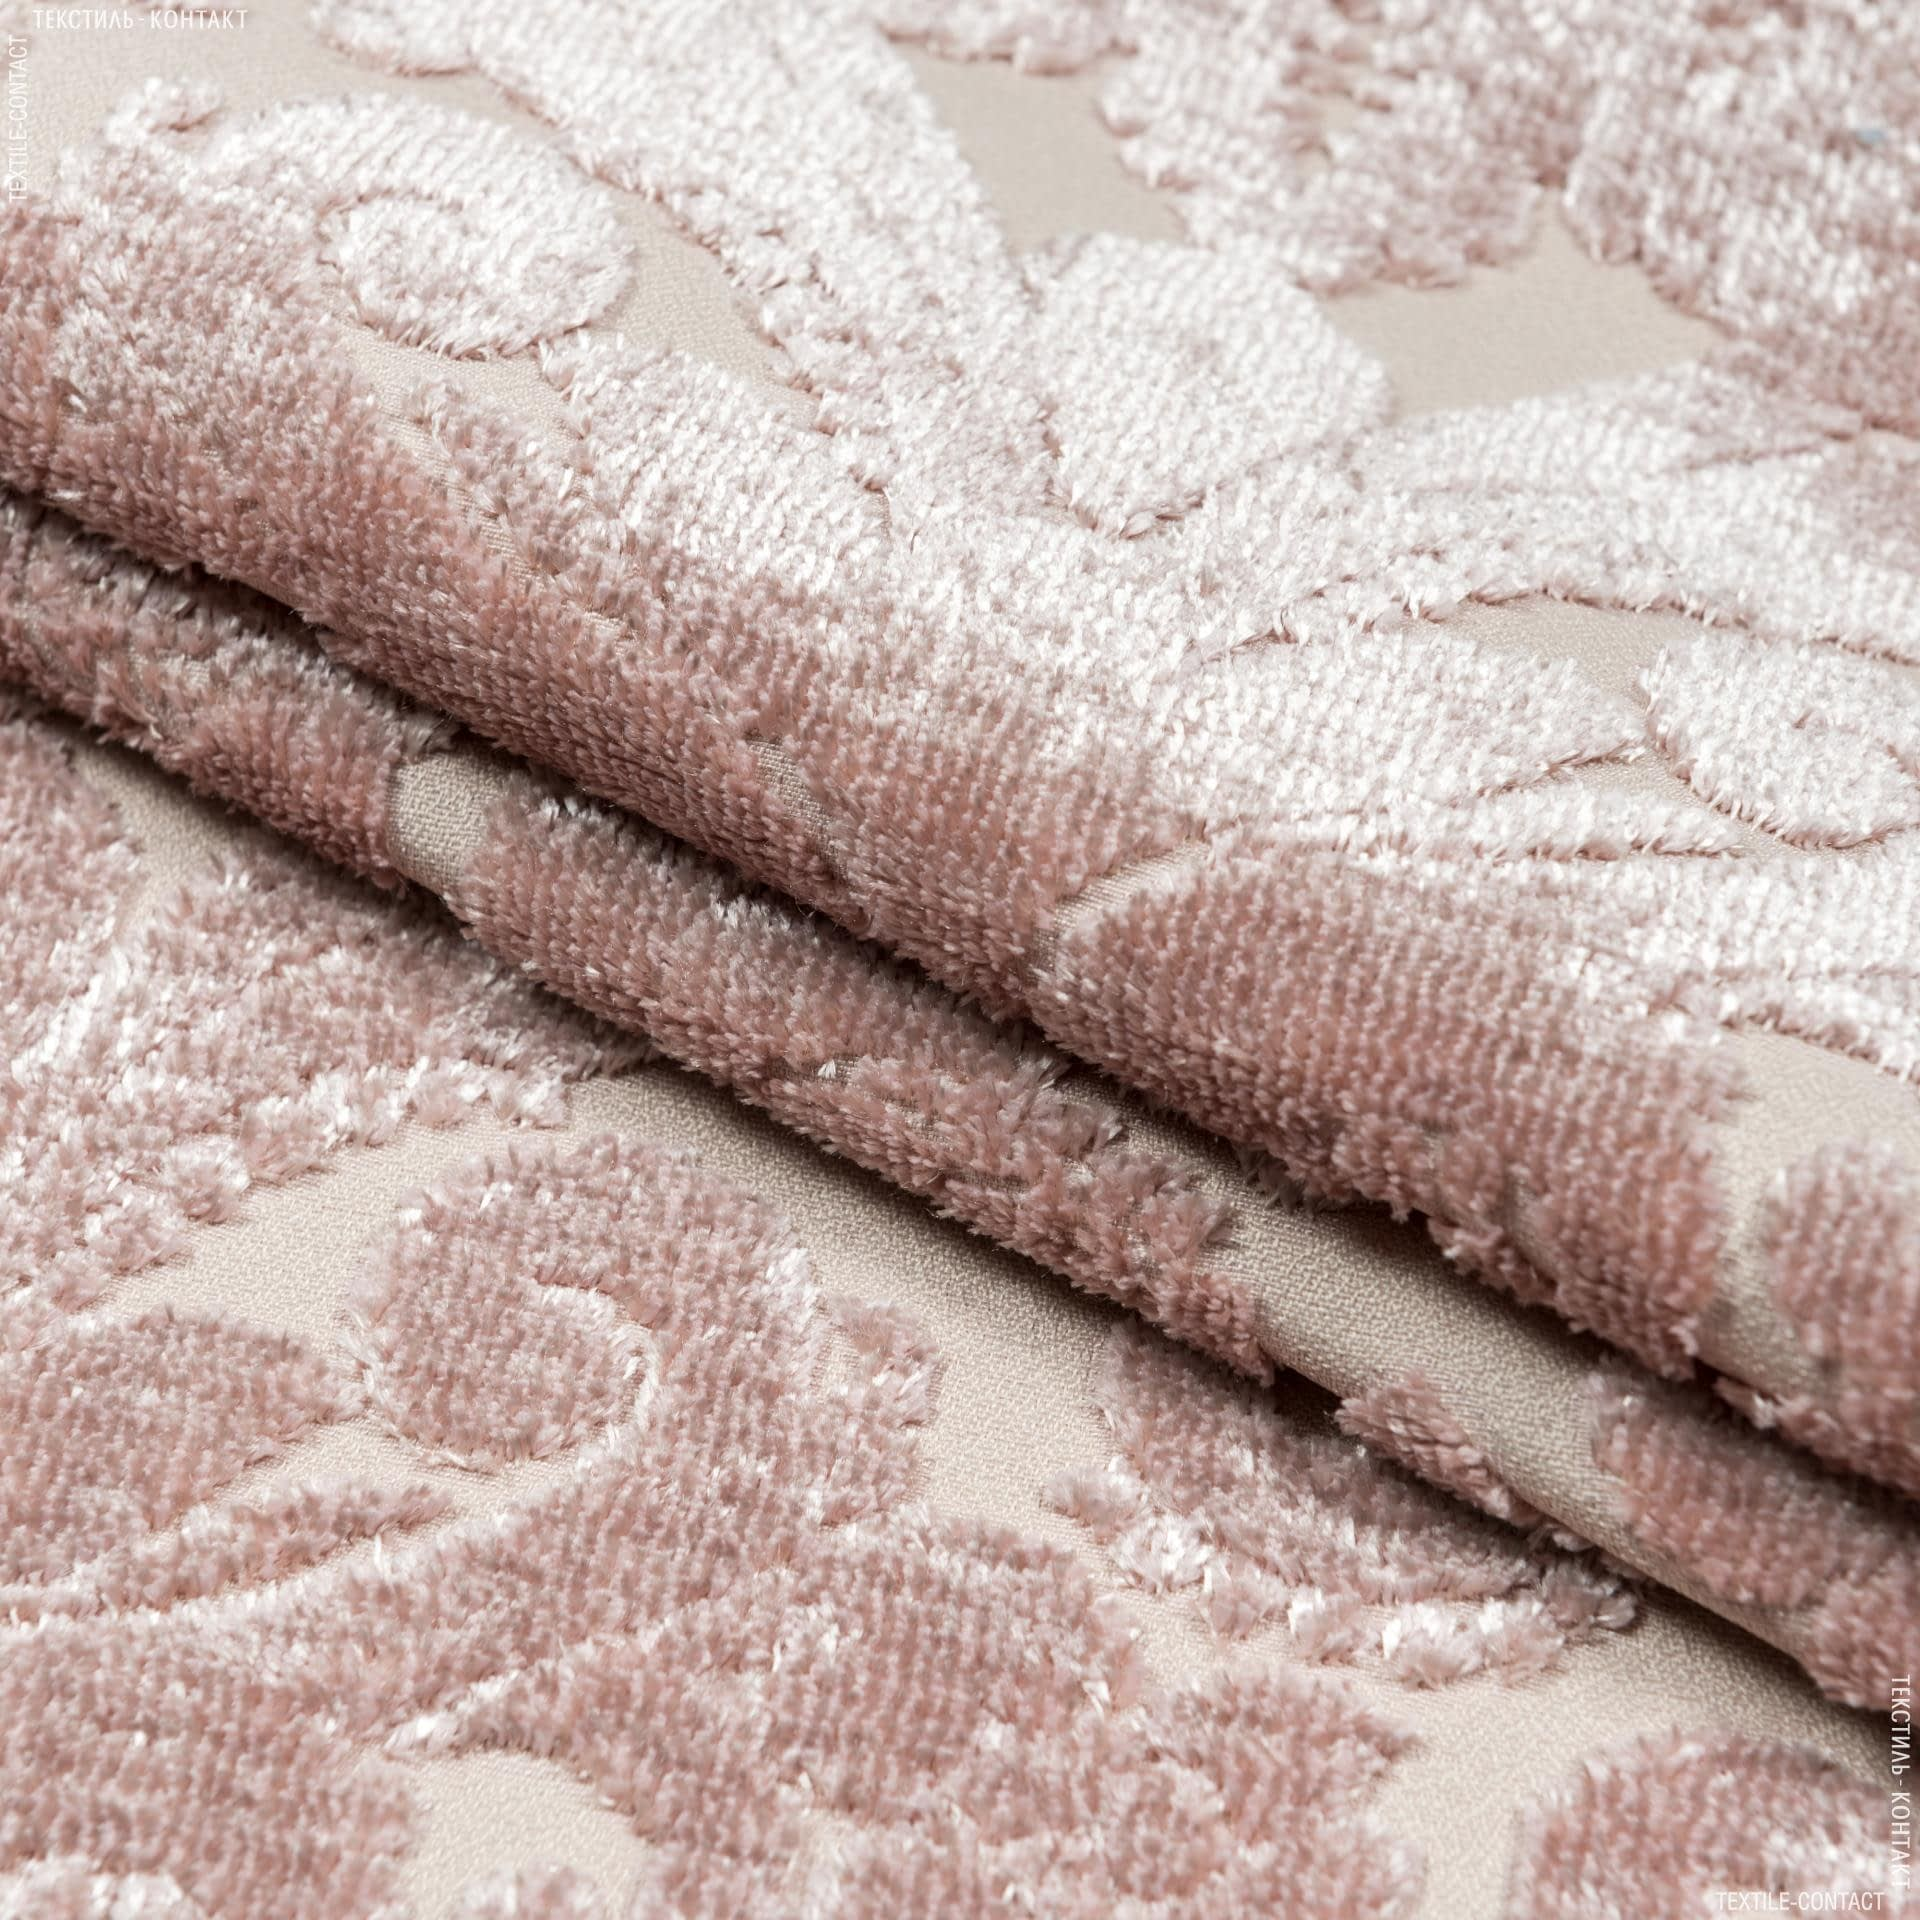 Ткани для мебели - Велюр  жаккард жасмин вензель/jasmine  св.розовый  м